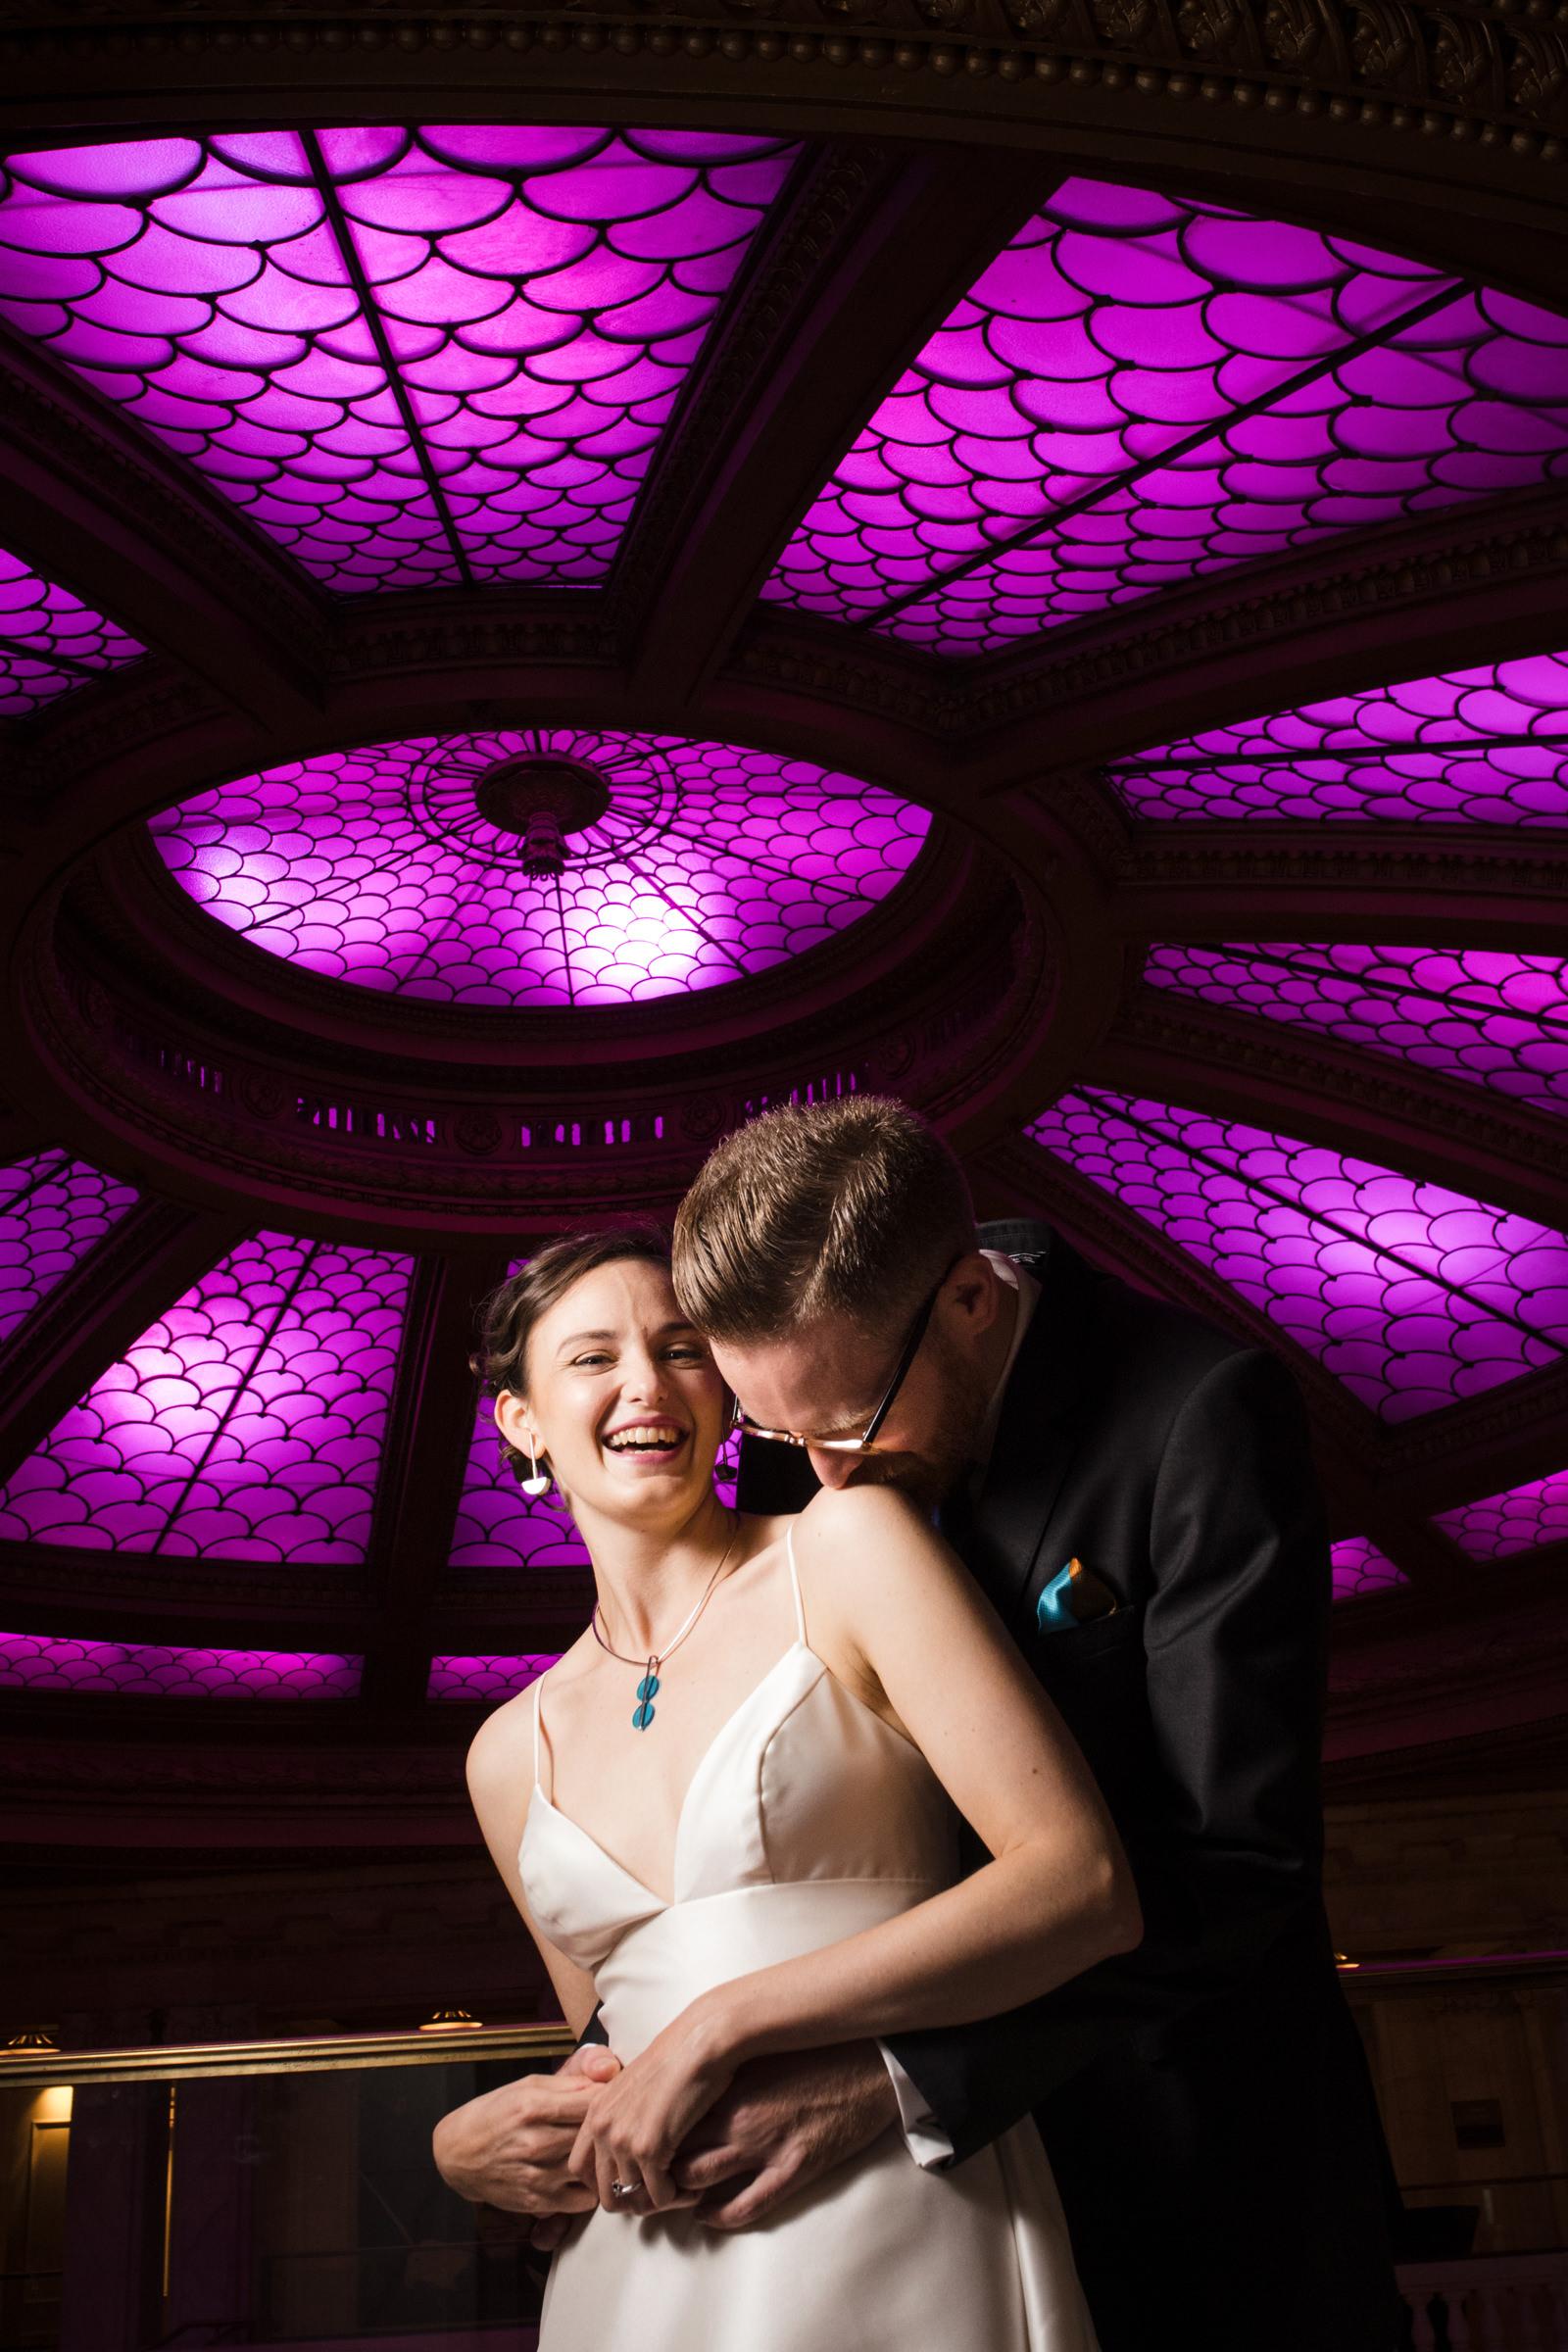 happy-portrait-of-bride-and-groom-on-the-dance-floor-by-joe-appel-photography-pennsylvania